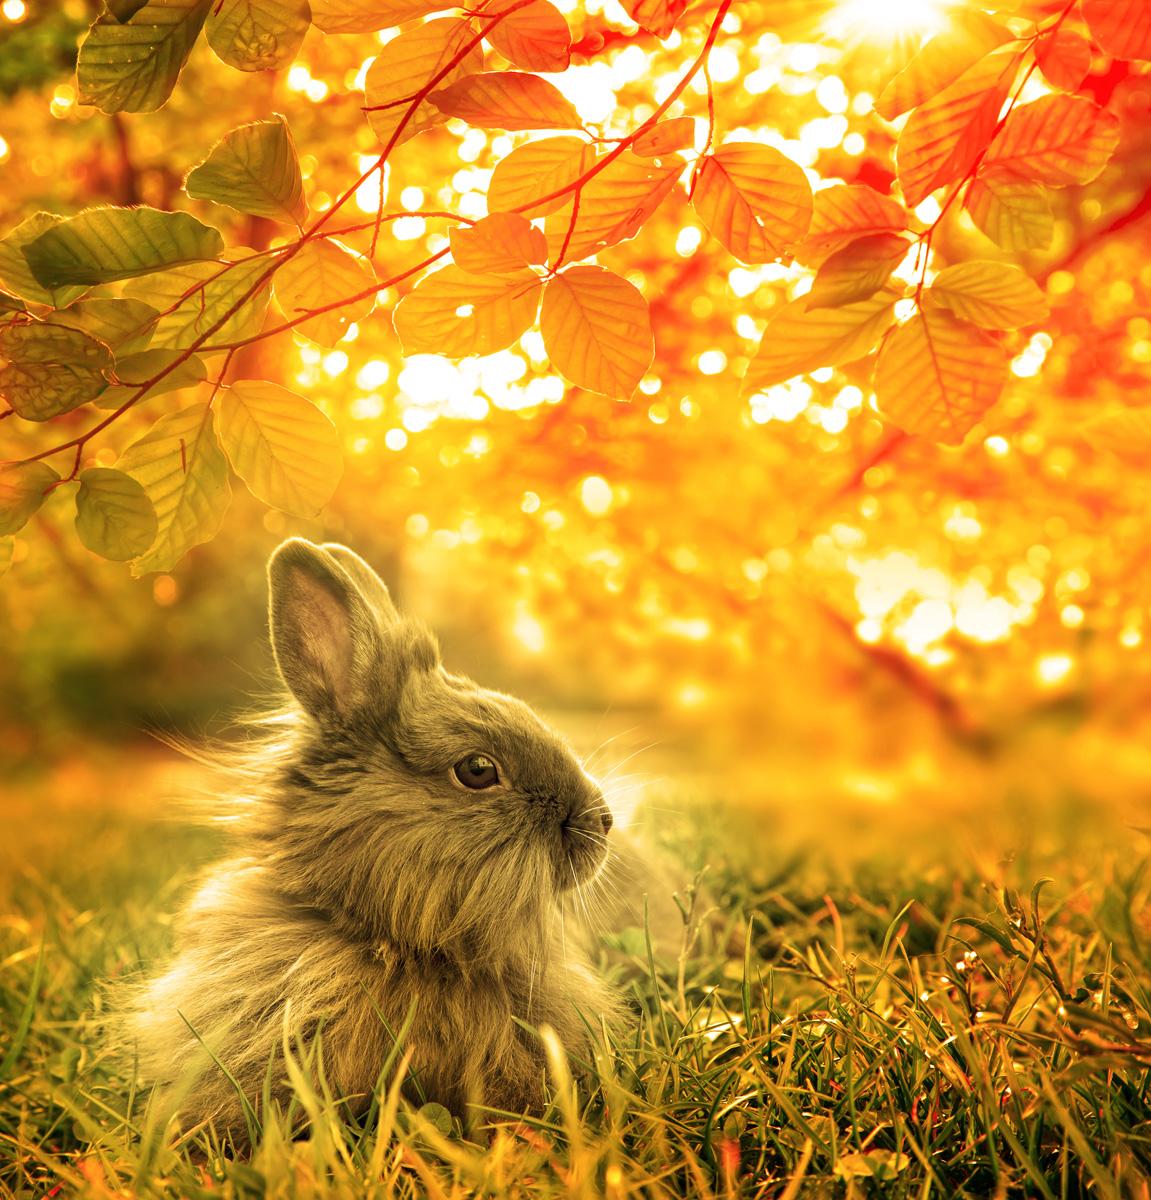 Autumnal Rabbit Beautiful Art Design Background